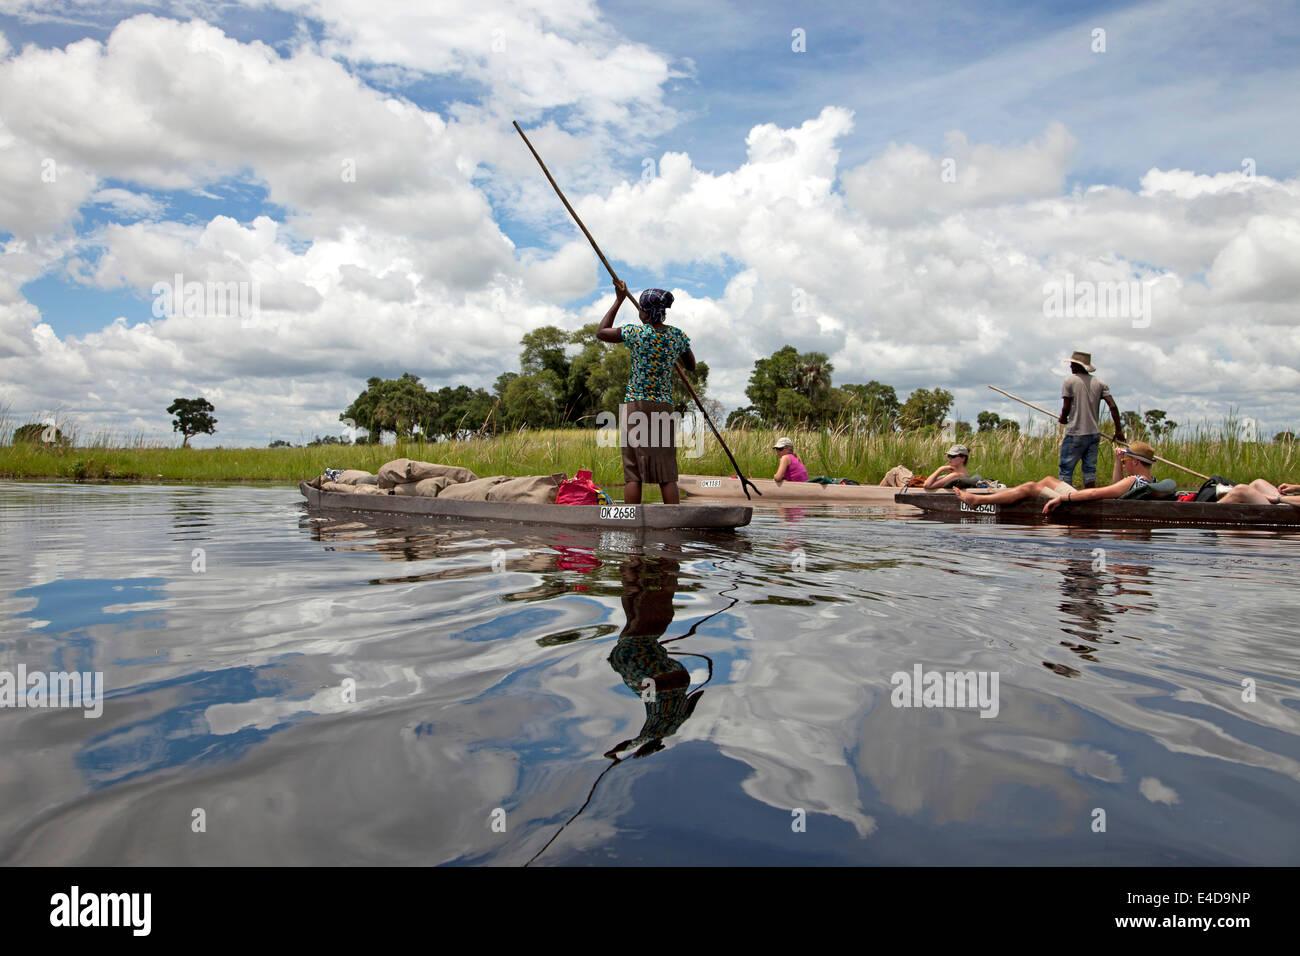 tourists  on a traditional mokoro boat in the Okavango Delta, Botswana, Africa - Stock Image